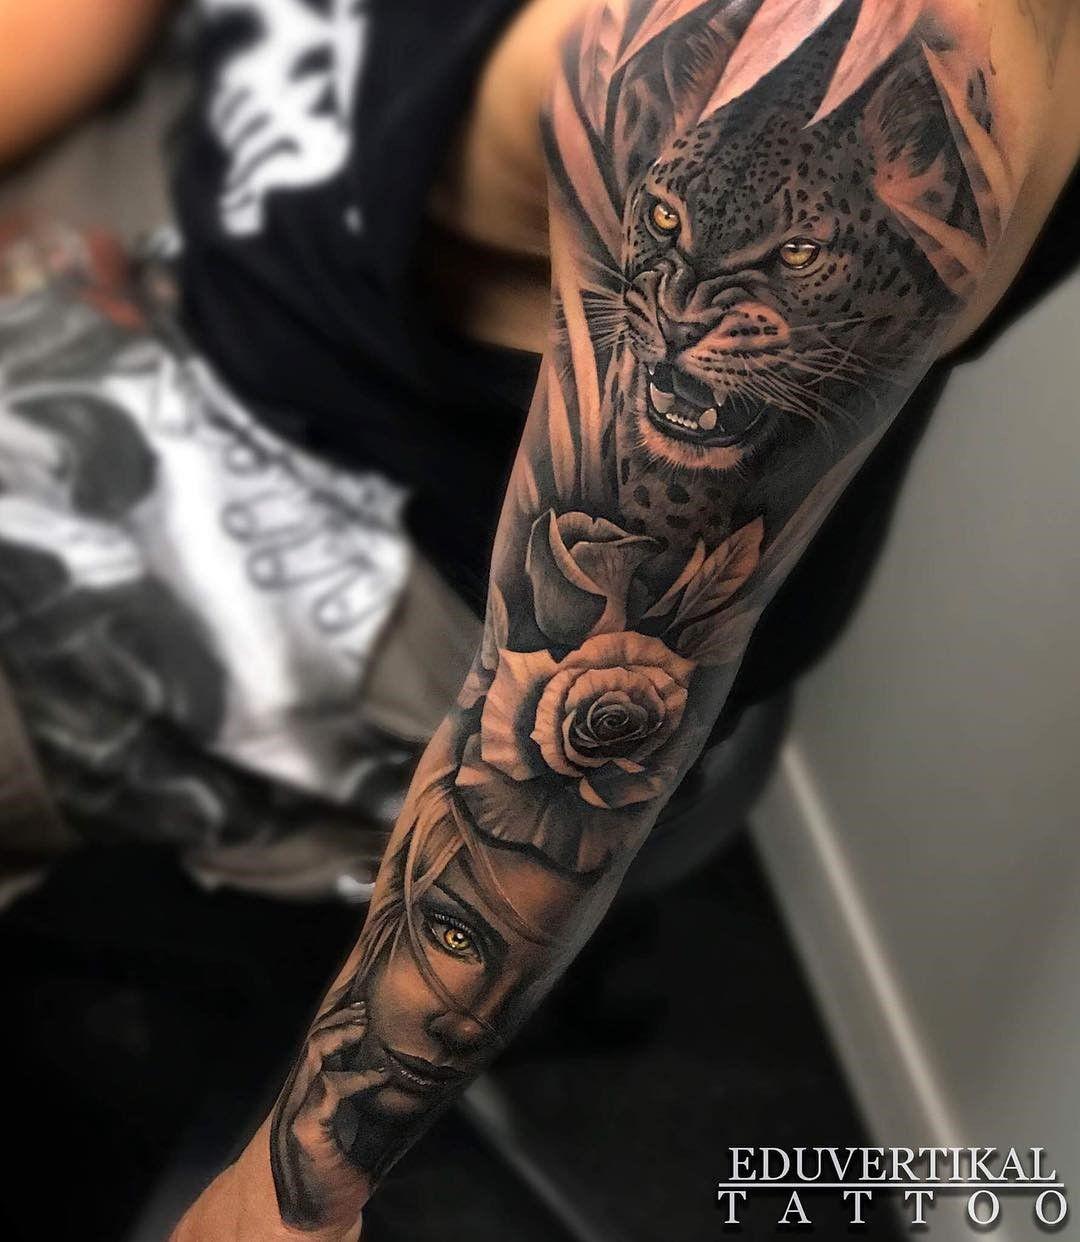 Pin By Garrikmcnair Yputlqtattoomodel On Sleeve Tattoo Designs